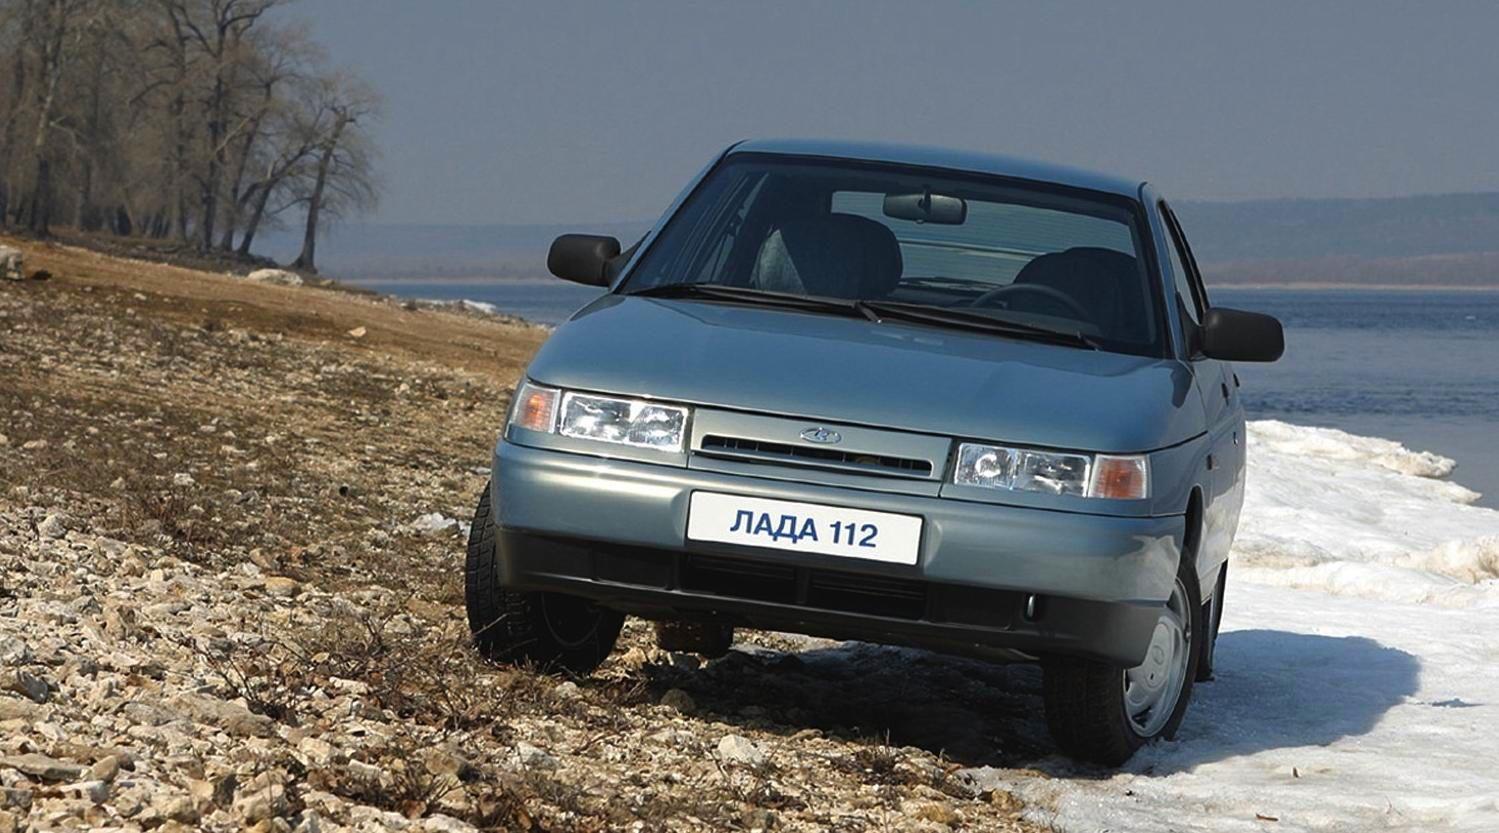 Russia 1996-2002: Lada 110, Samara and 2104-7 on top